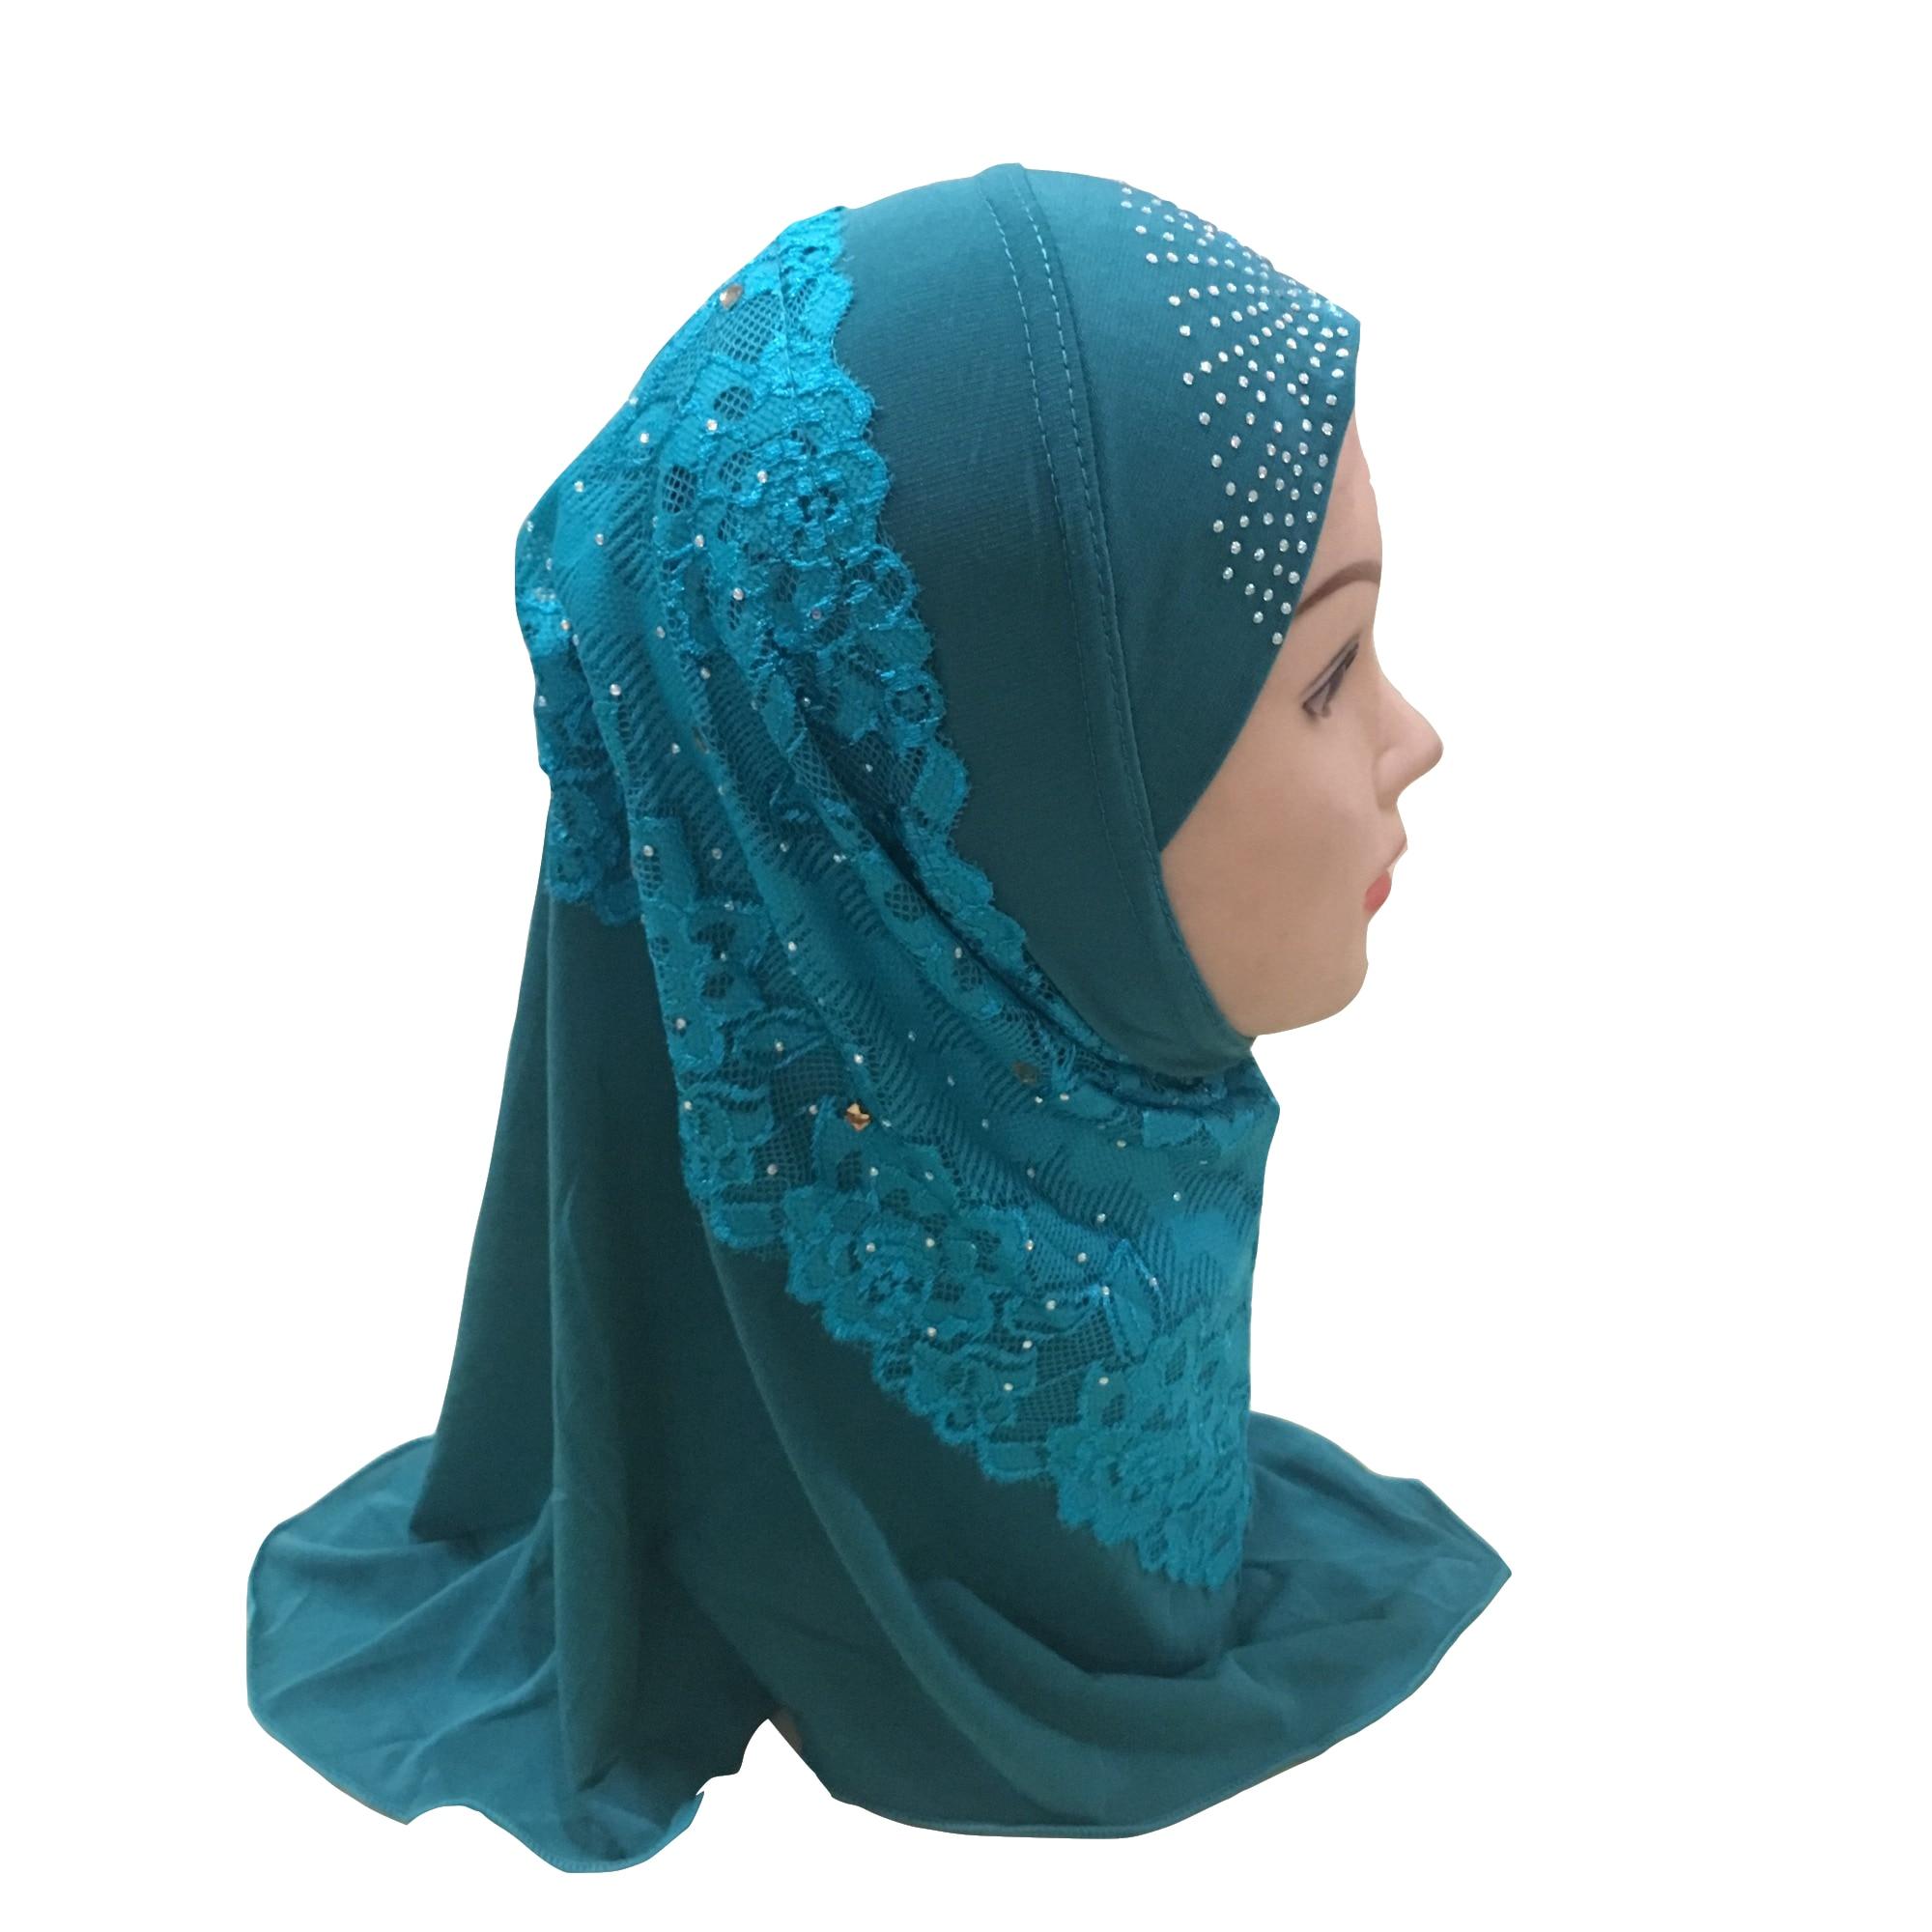 Image 3 - Muslim Girls Hijab Kids Hijab Islamic Fashion Scarf Shawls with  Beautiful Lace Diamond WholesaleIslamic Clothing